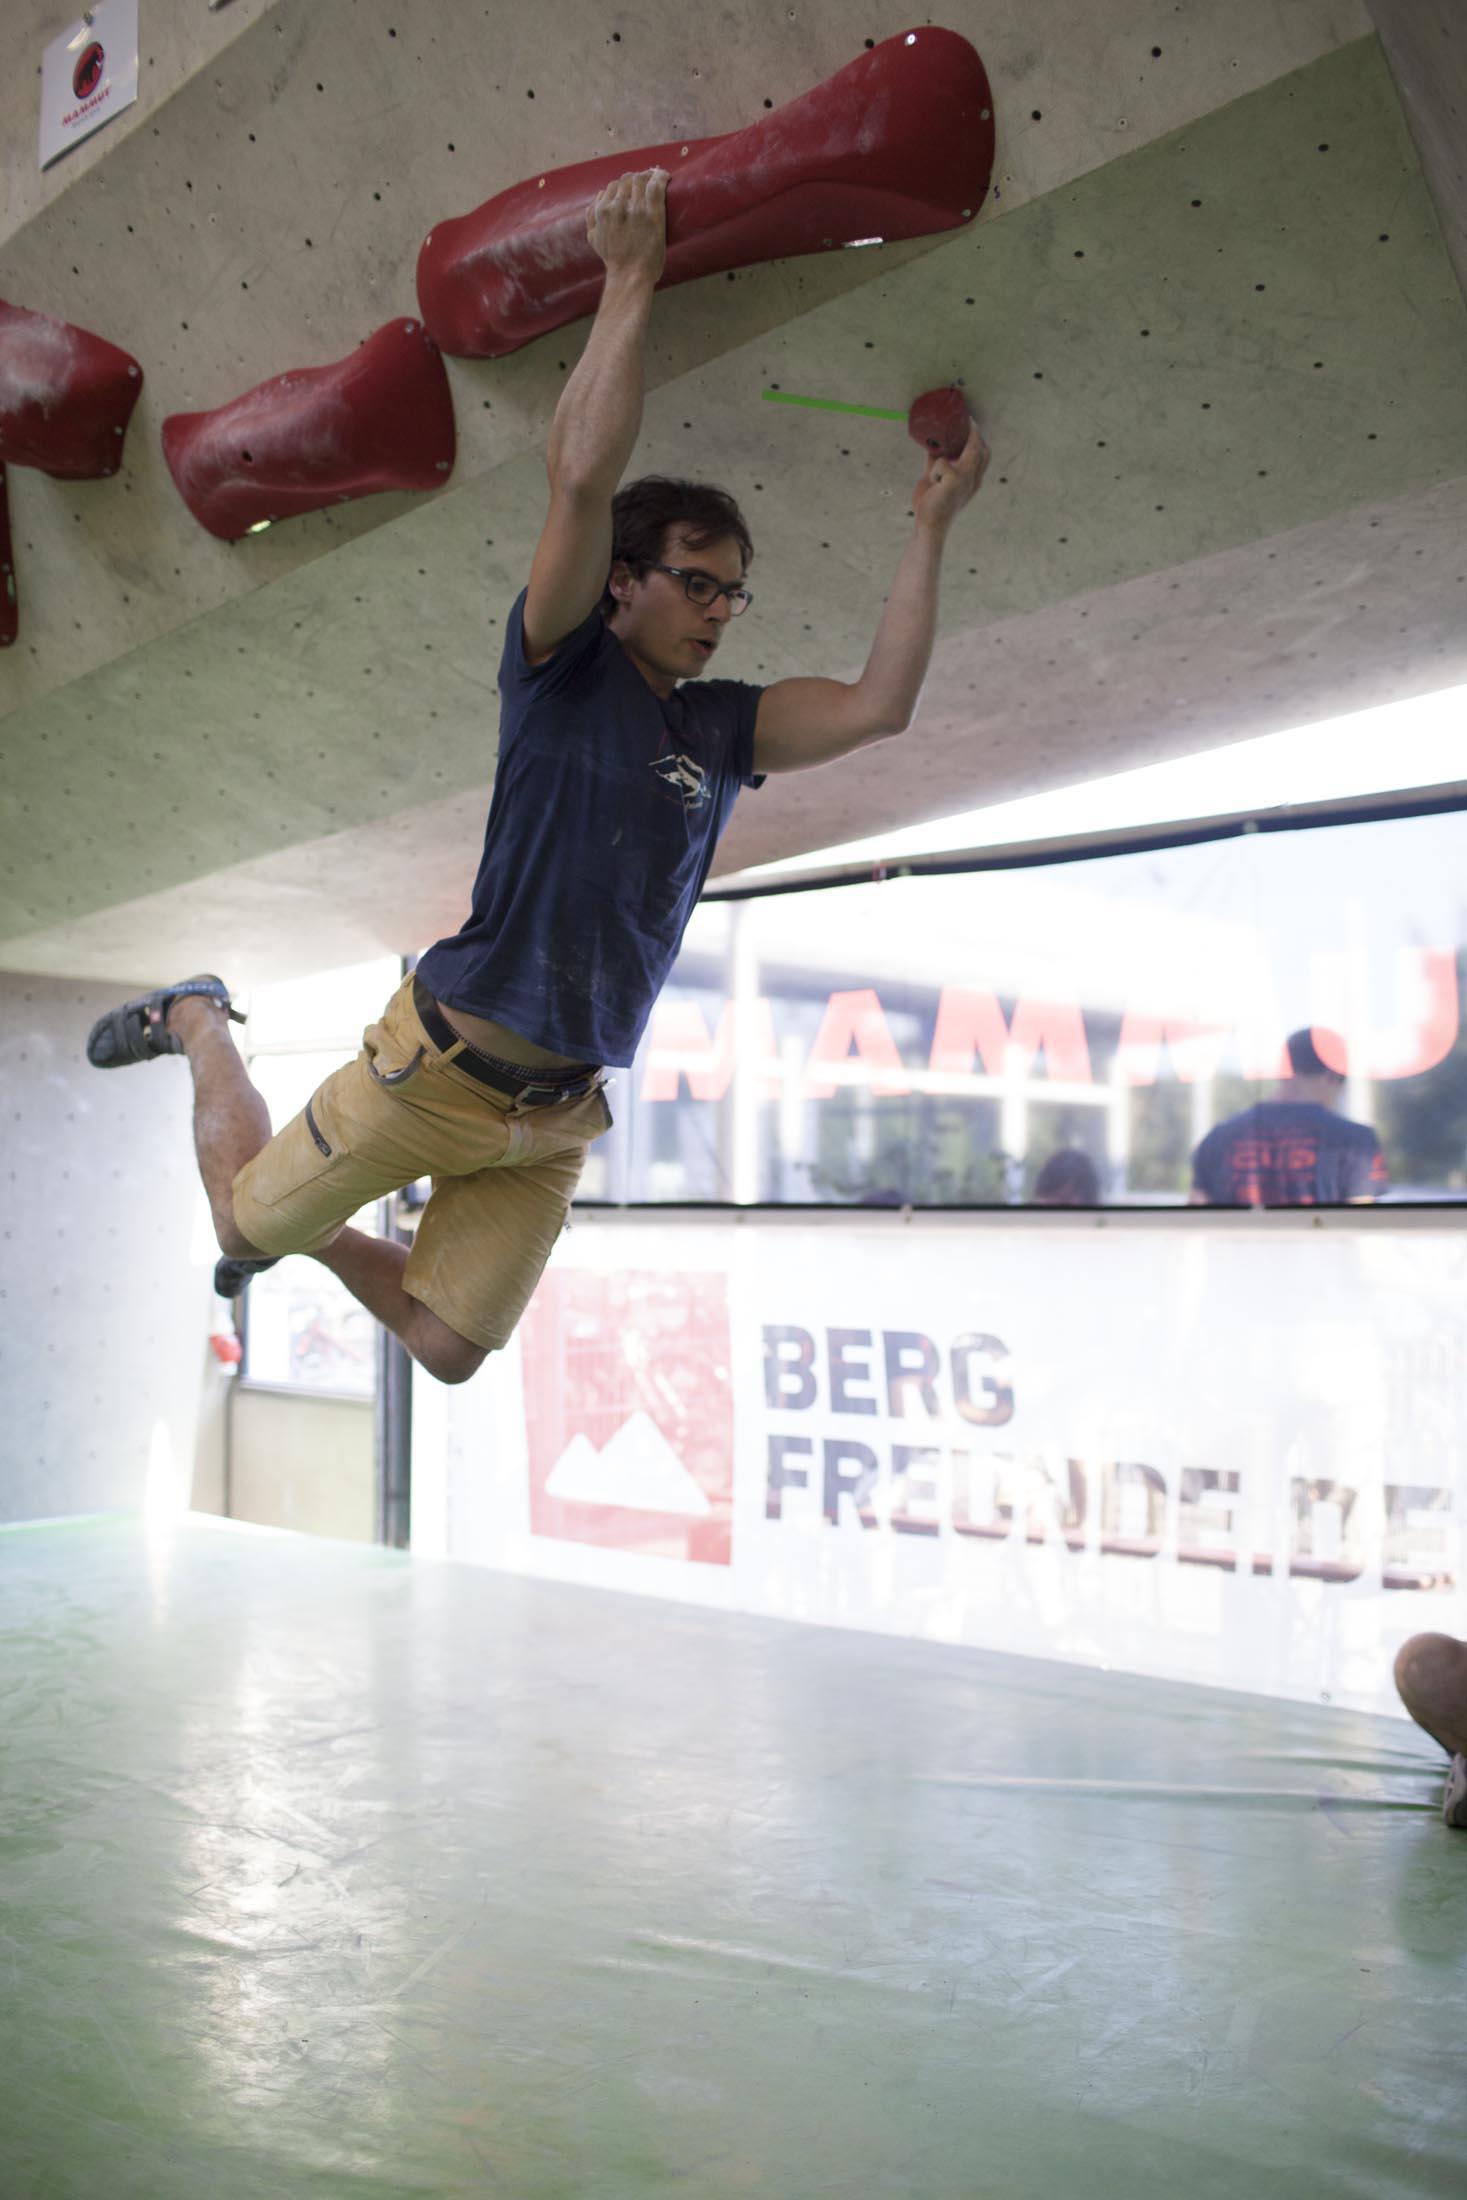 Finale, internationaler bouldercup Frankenjura 2016, BLOCKHELDEN Erlangen, Mammut, Bergfreunde.de, Boulderwettkampf07092016607